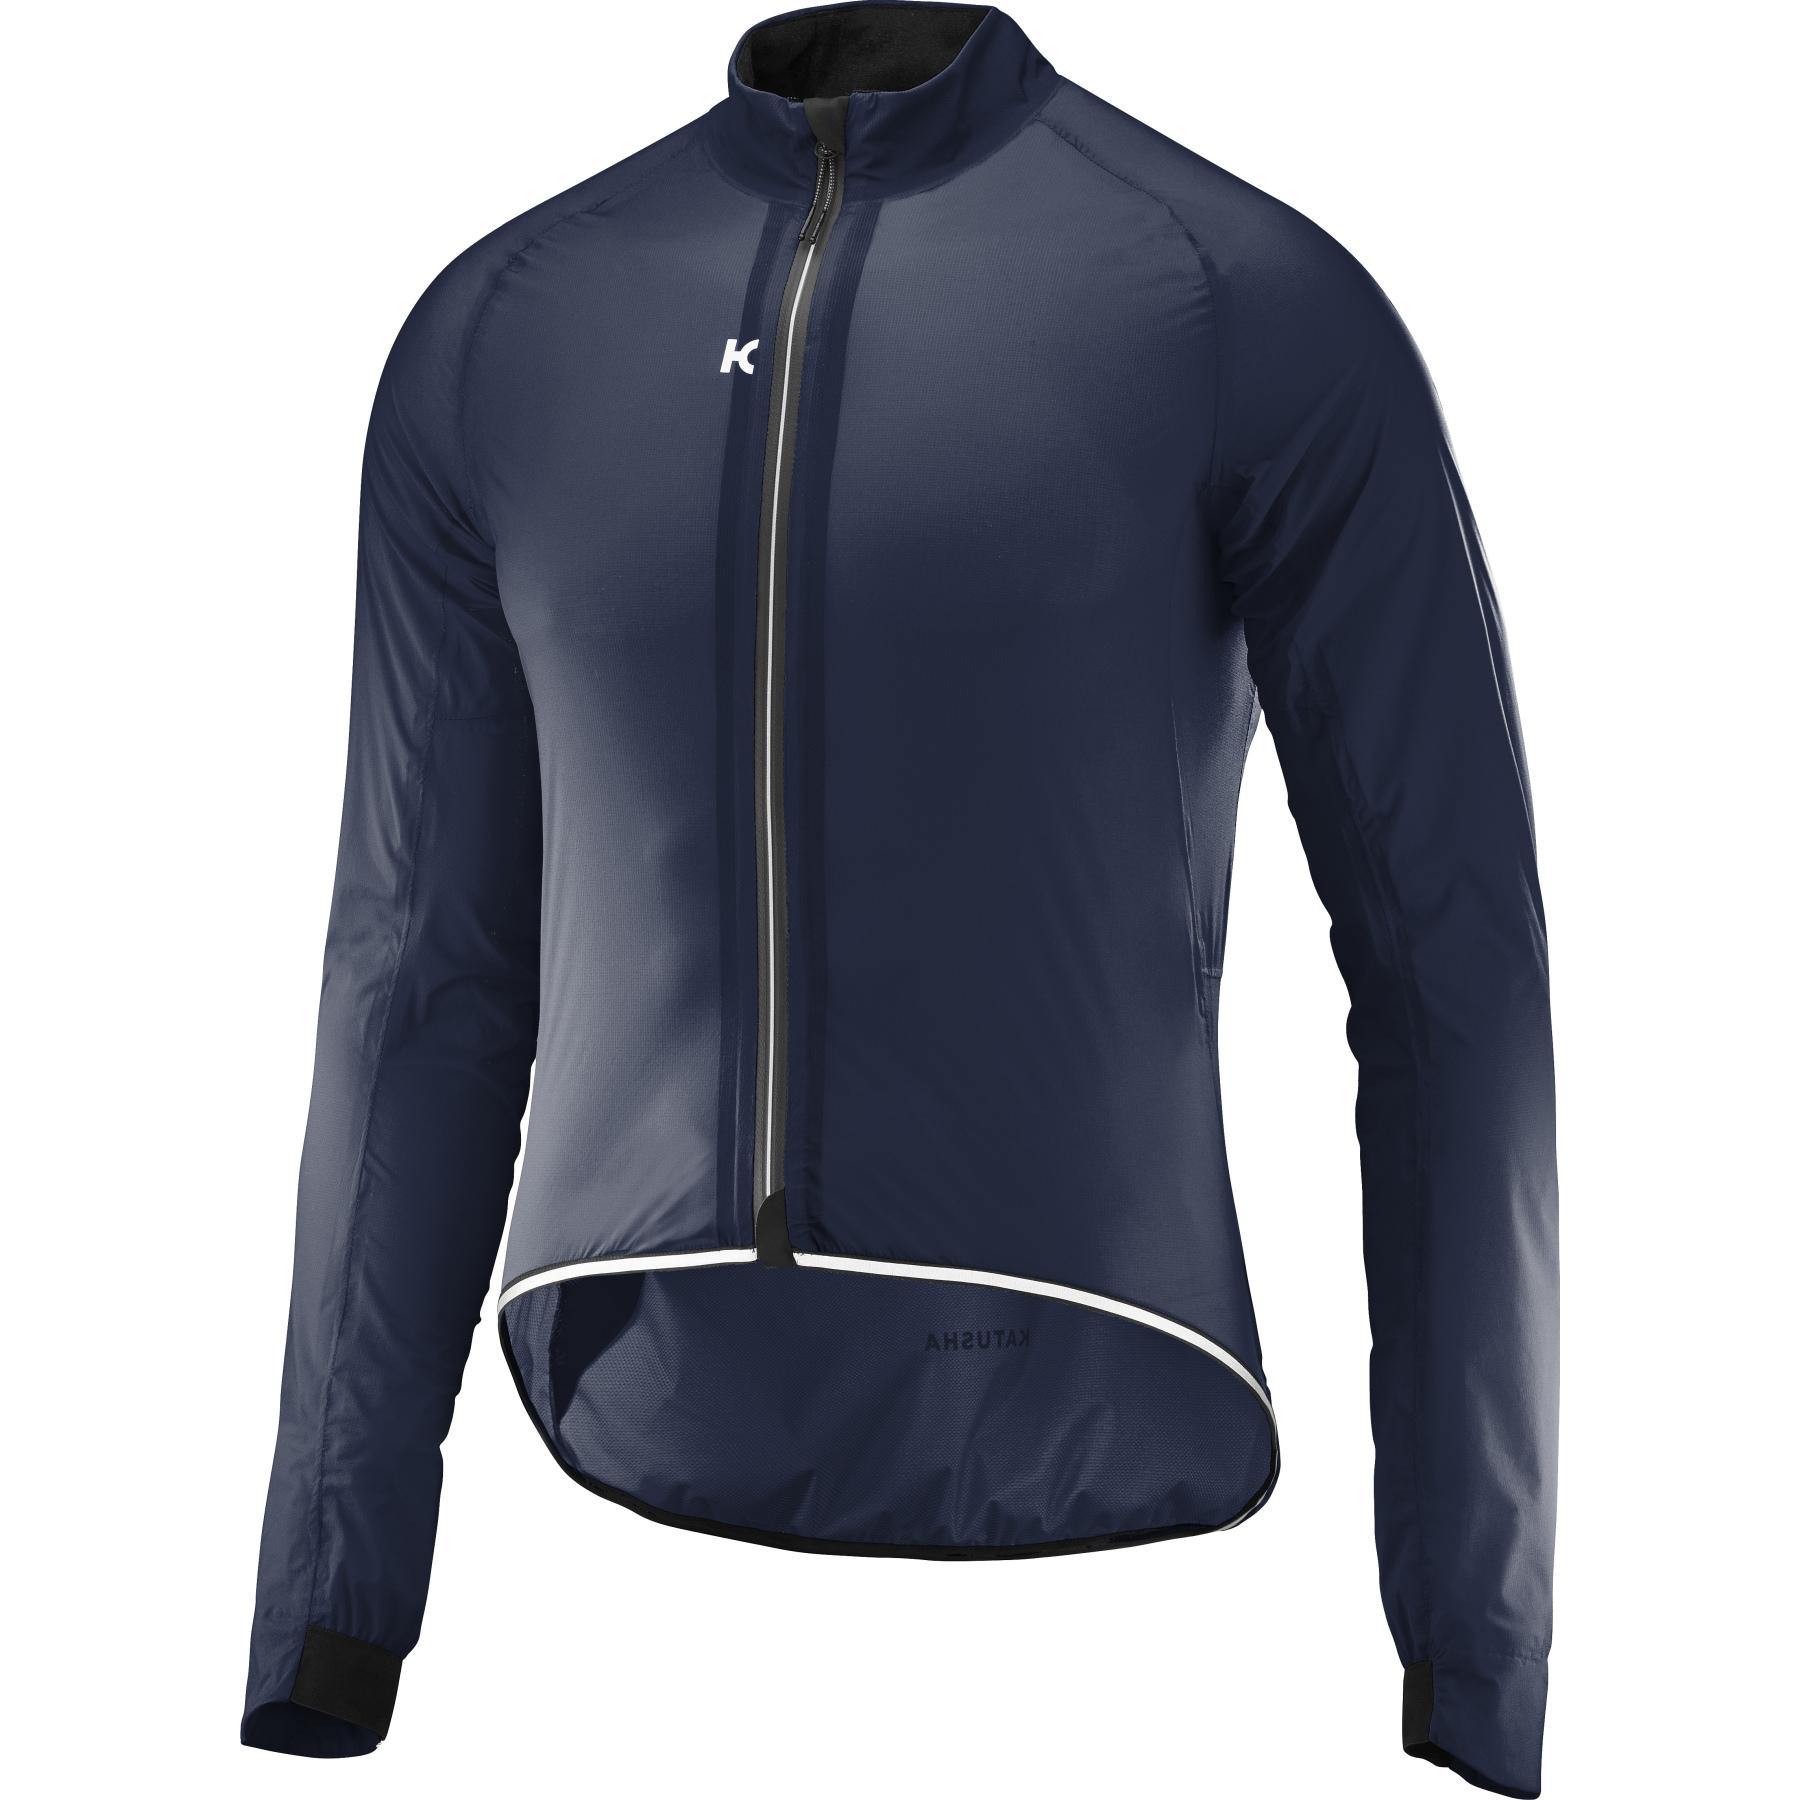 Katusha LIGHT RAIN Jacket - peacoat blue